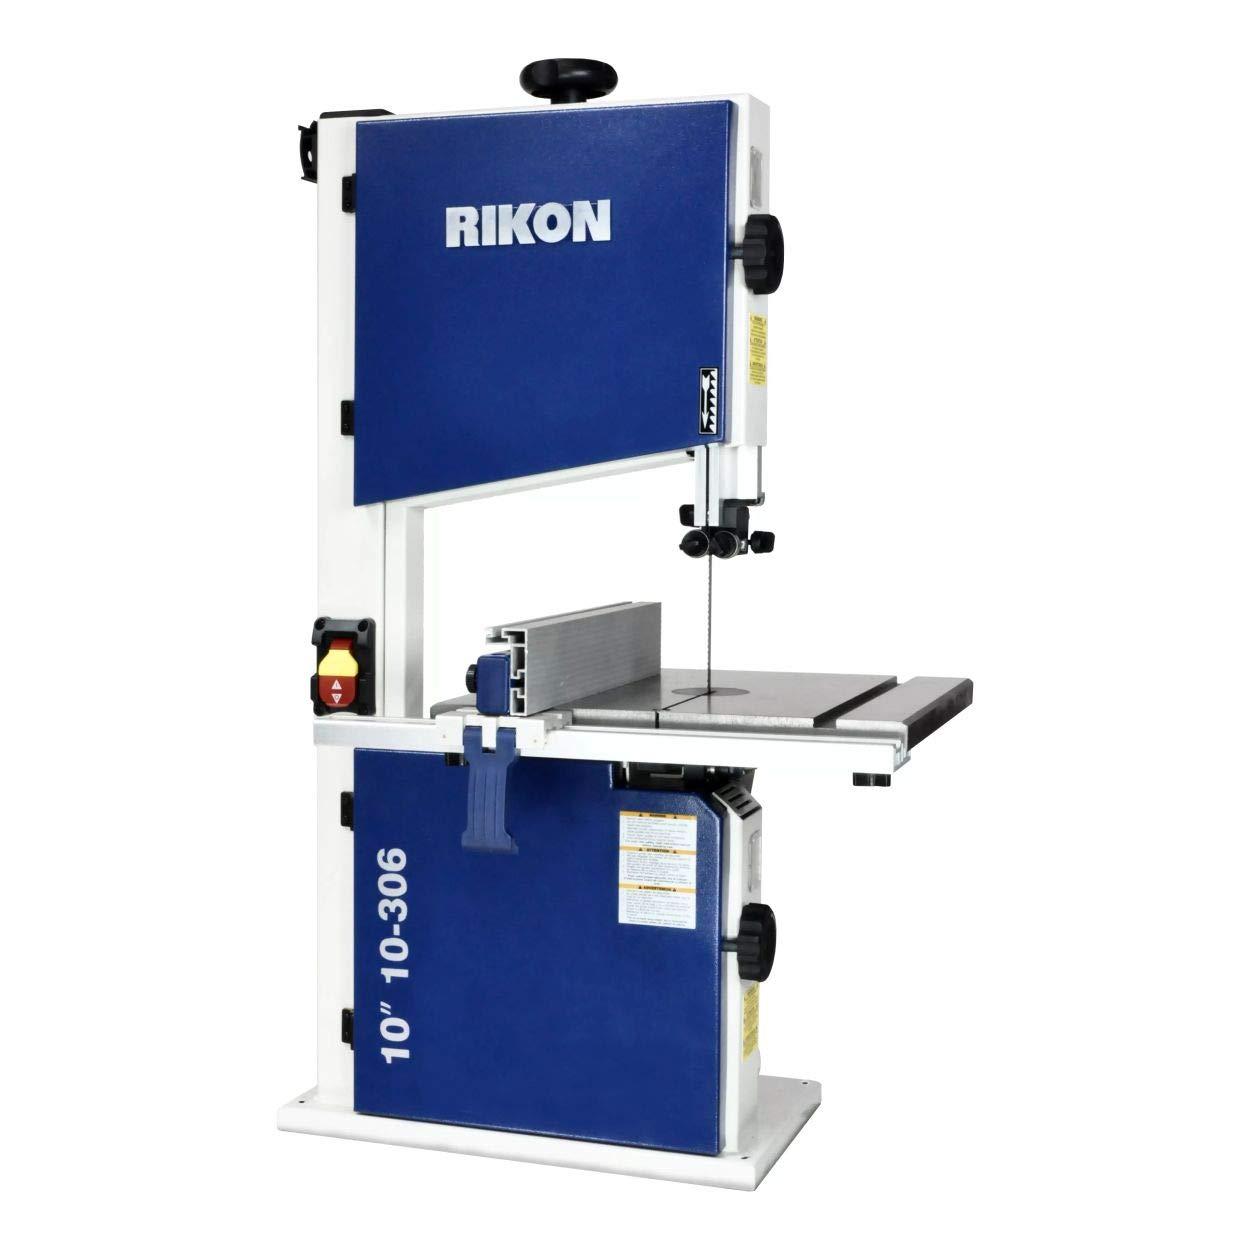 RIKON 10 In. Deluxe Bandsaw 1 2 HP